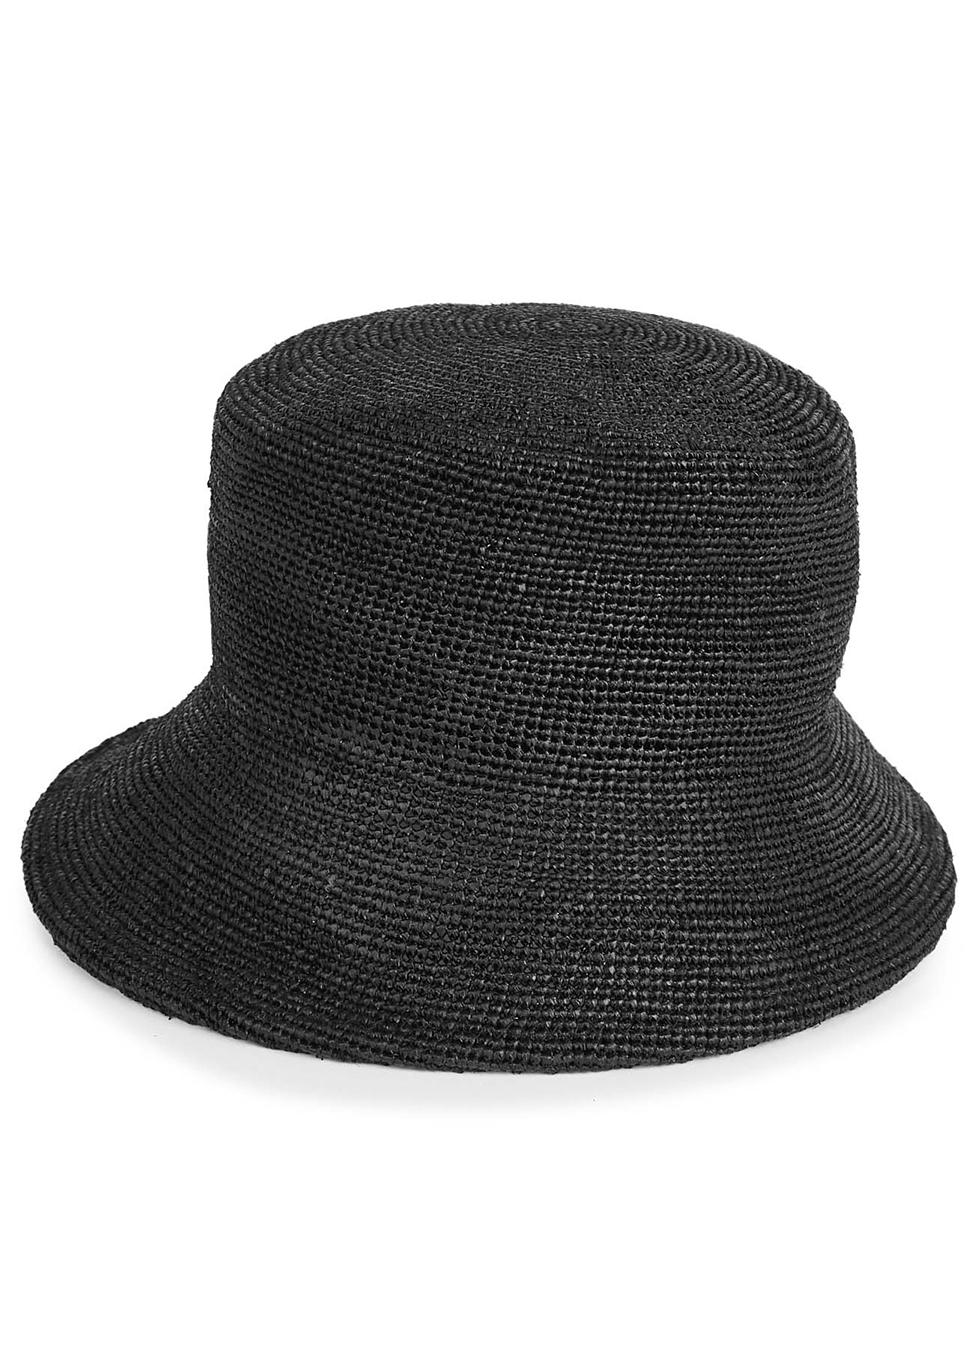 Inca black raffia straw bucket hat